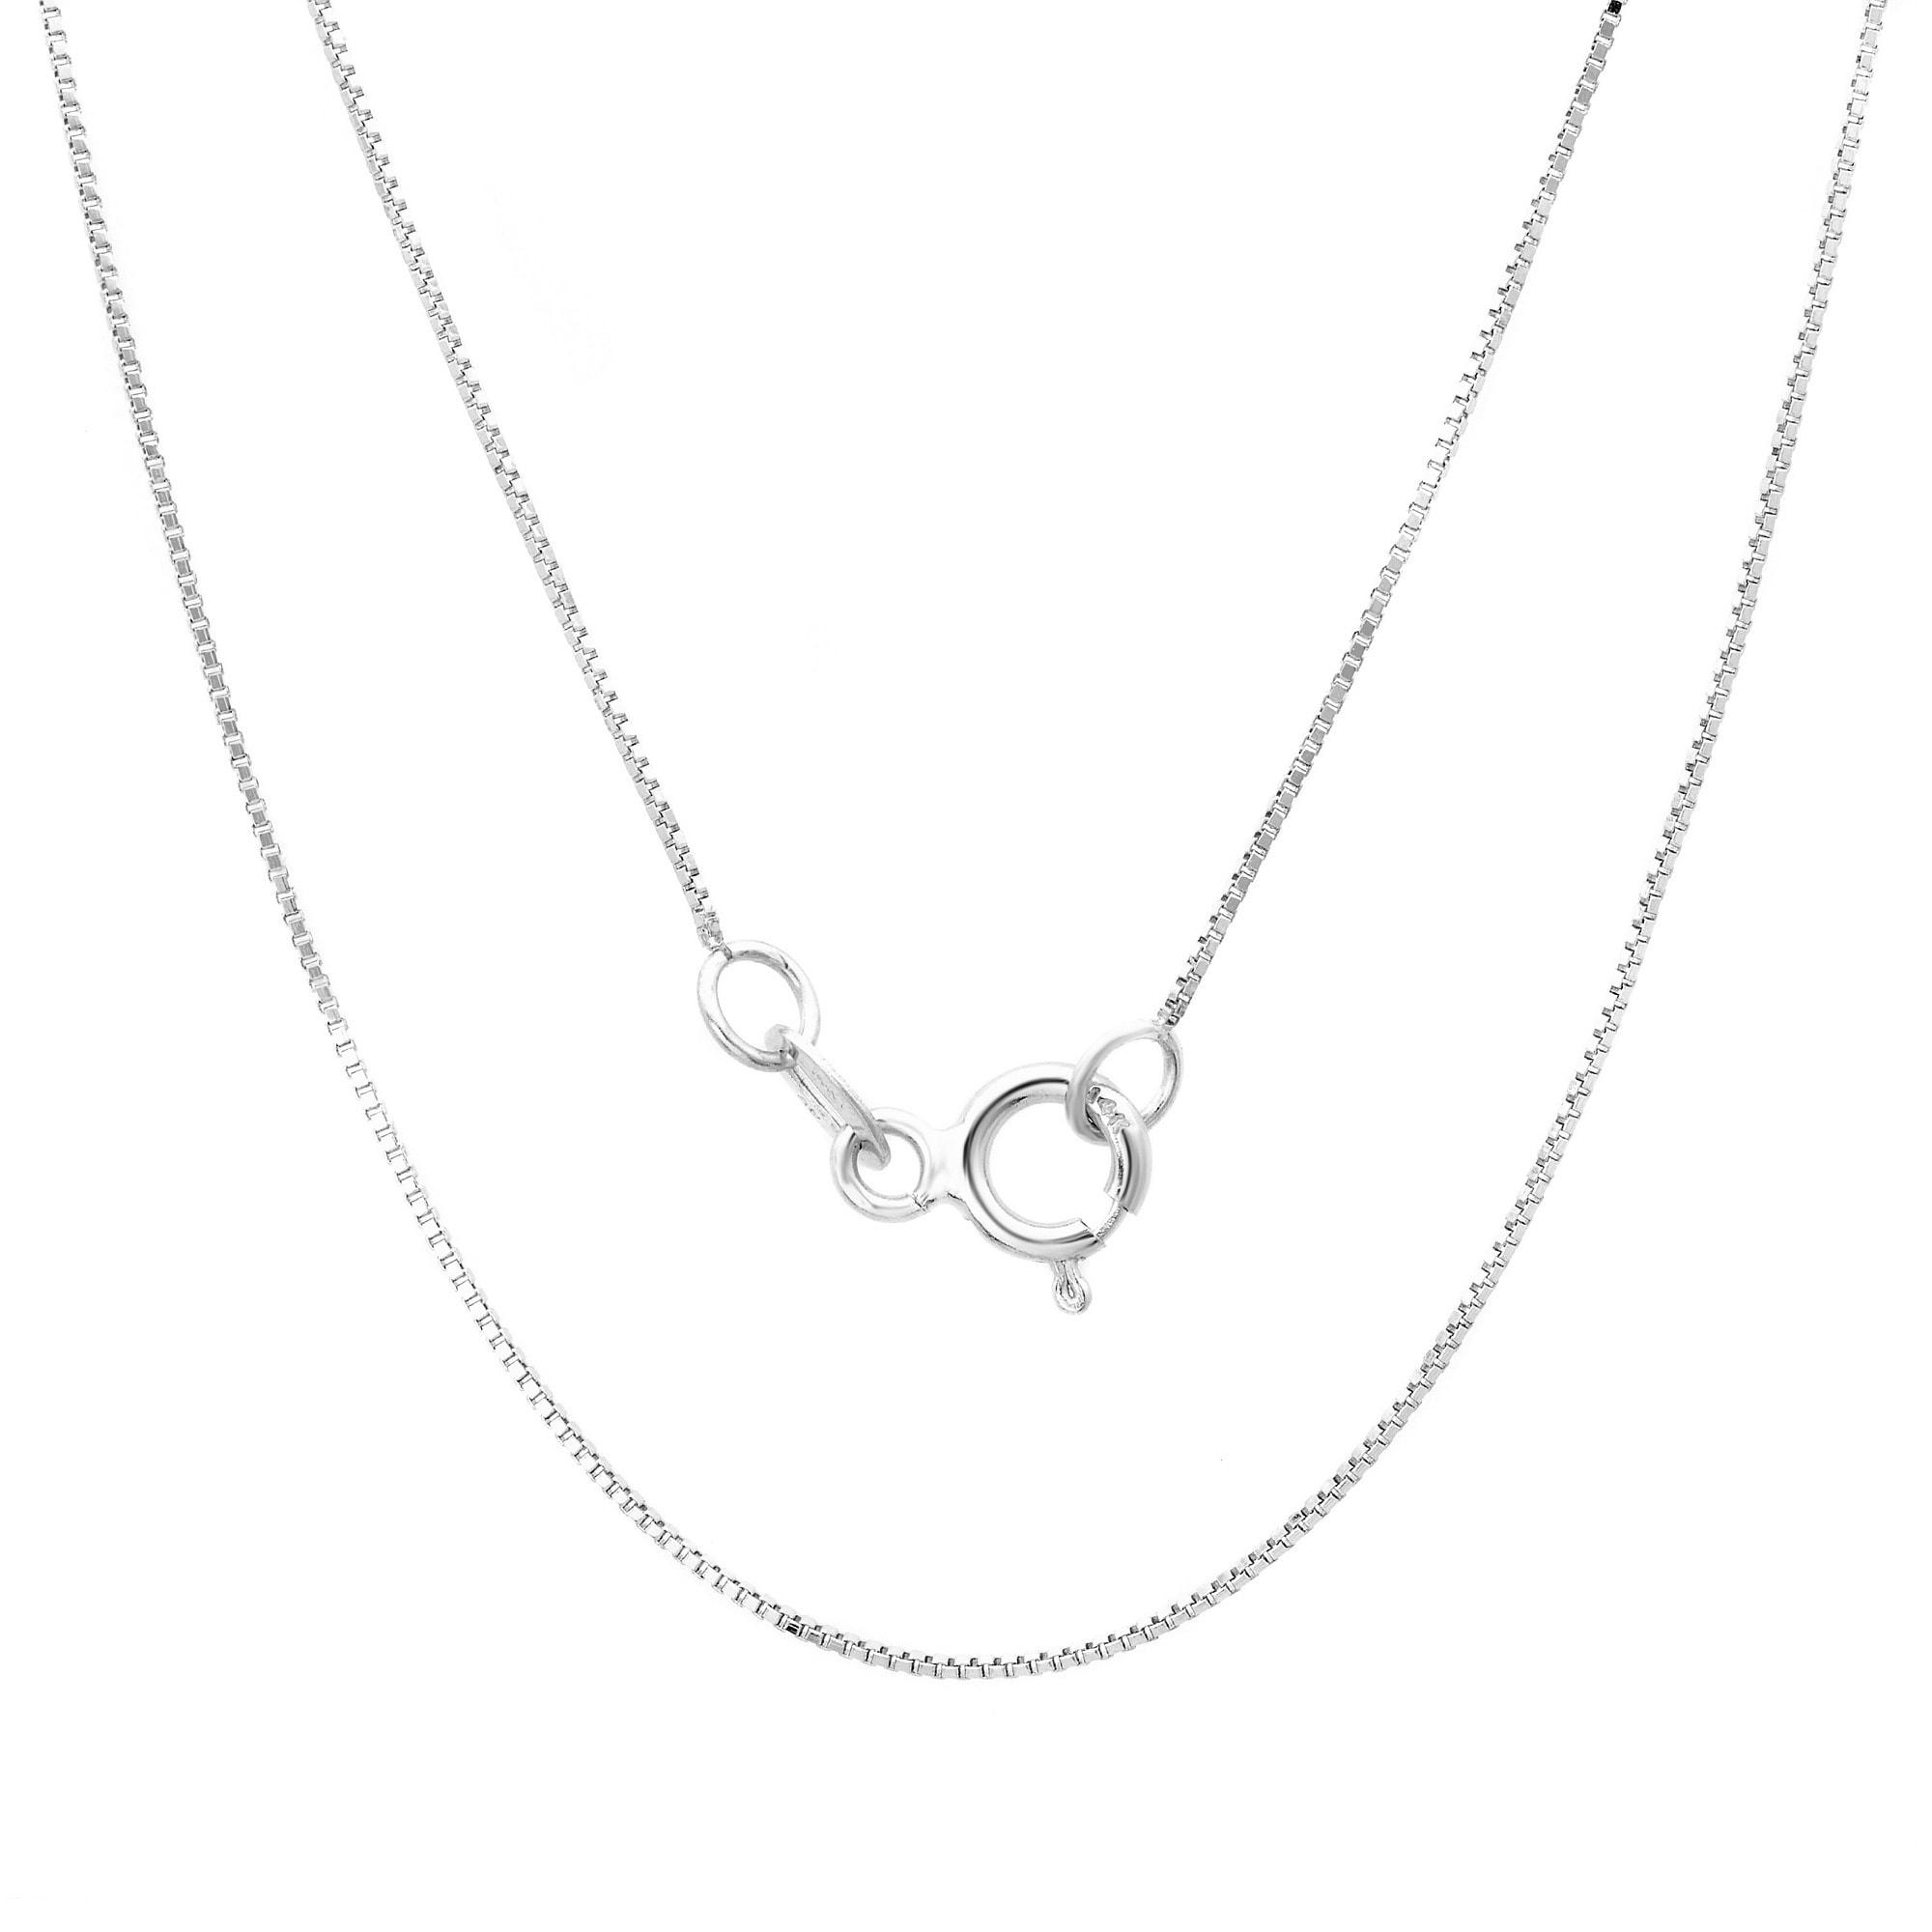 Diamond Wish 14k Gold 18 inch Box Chain Necklace .5 mm